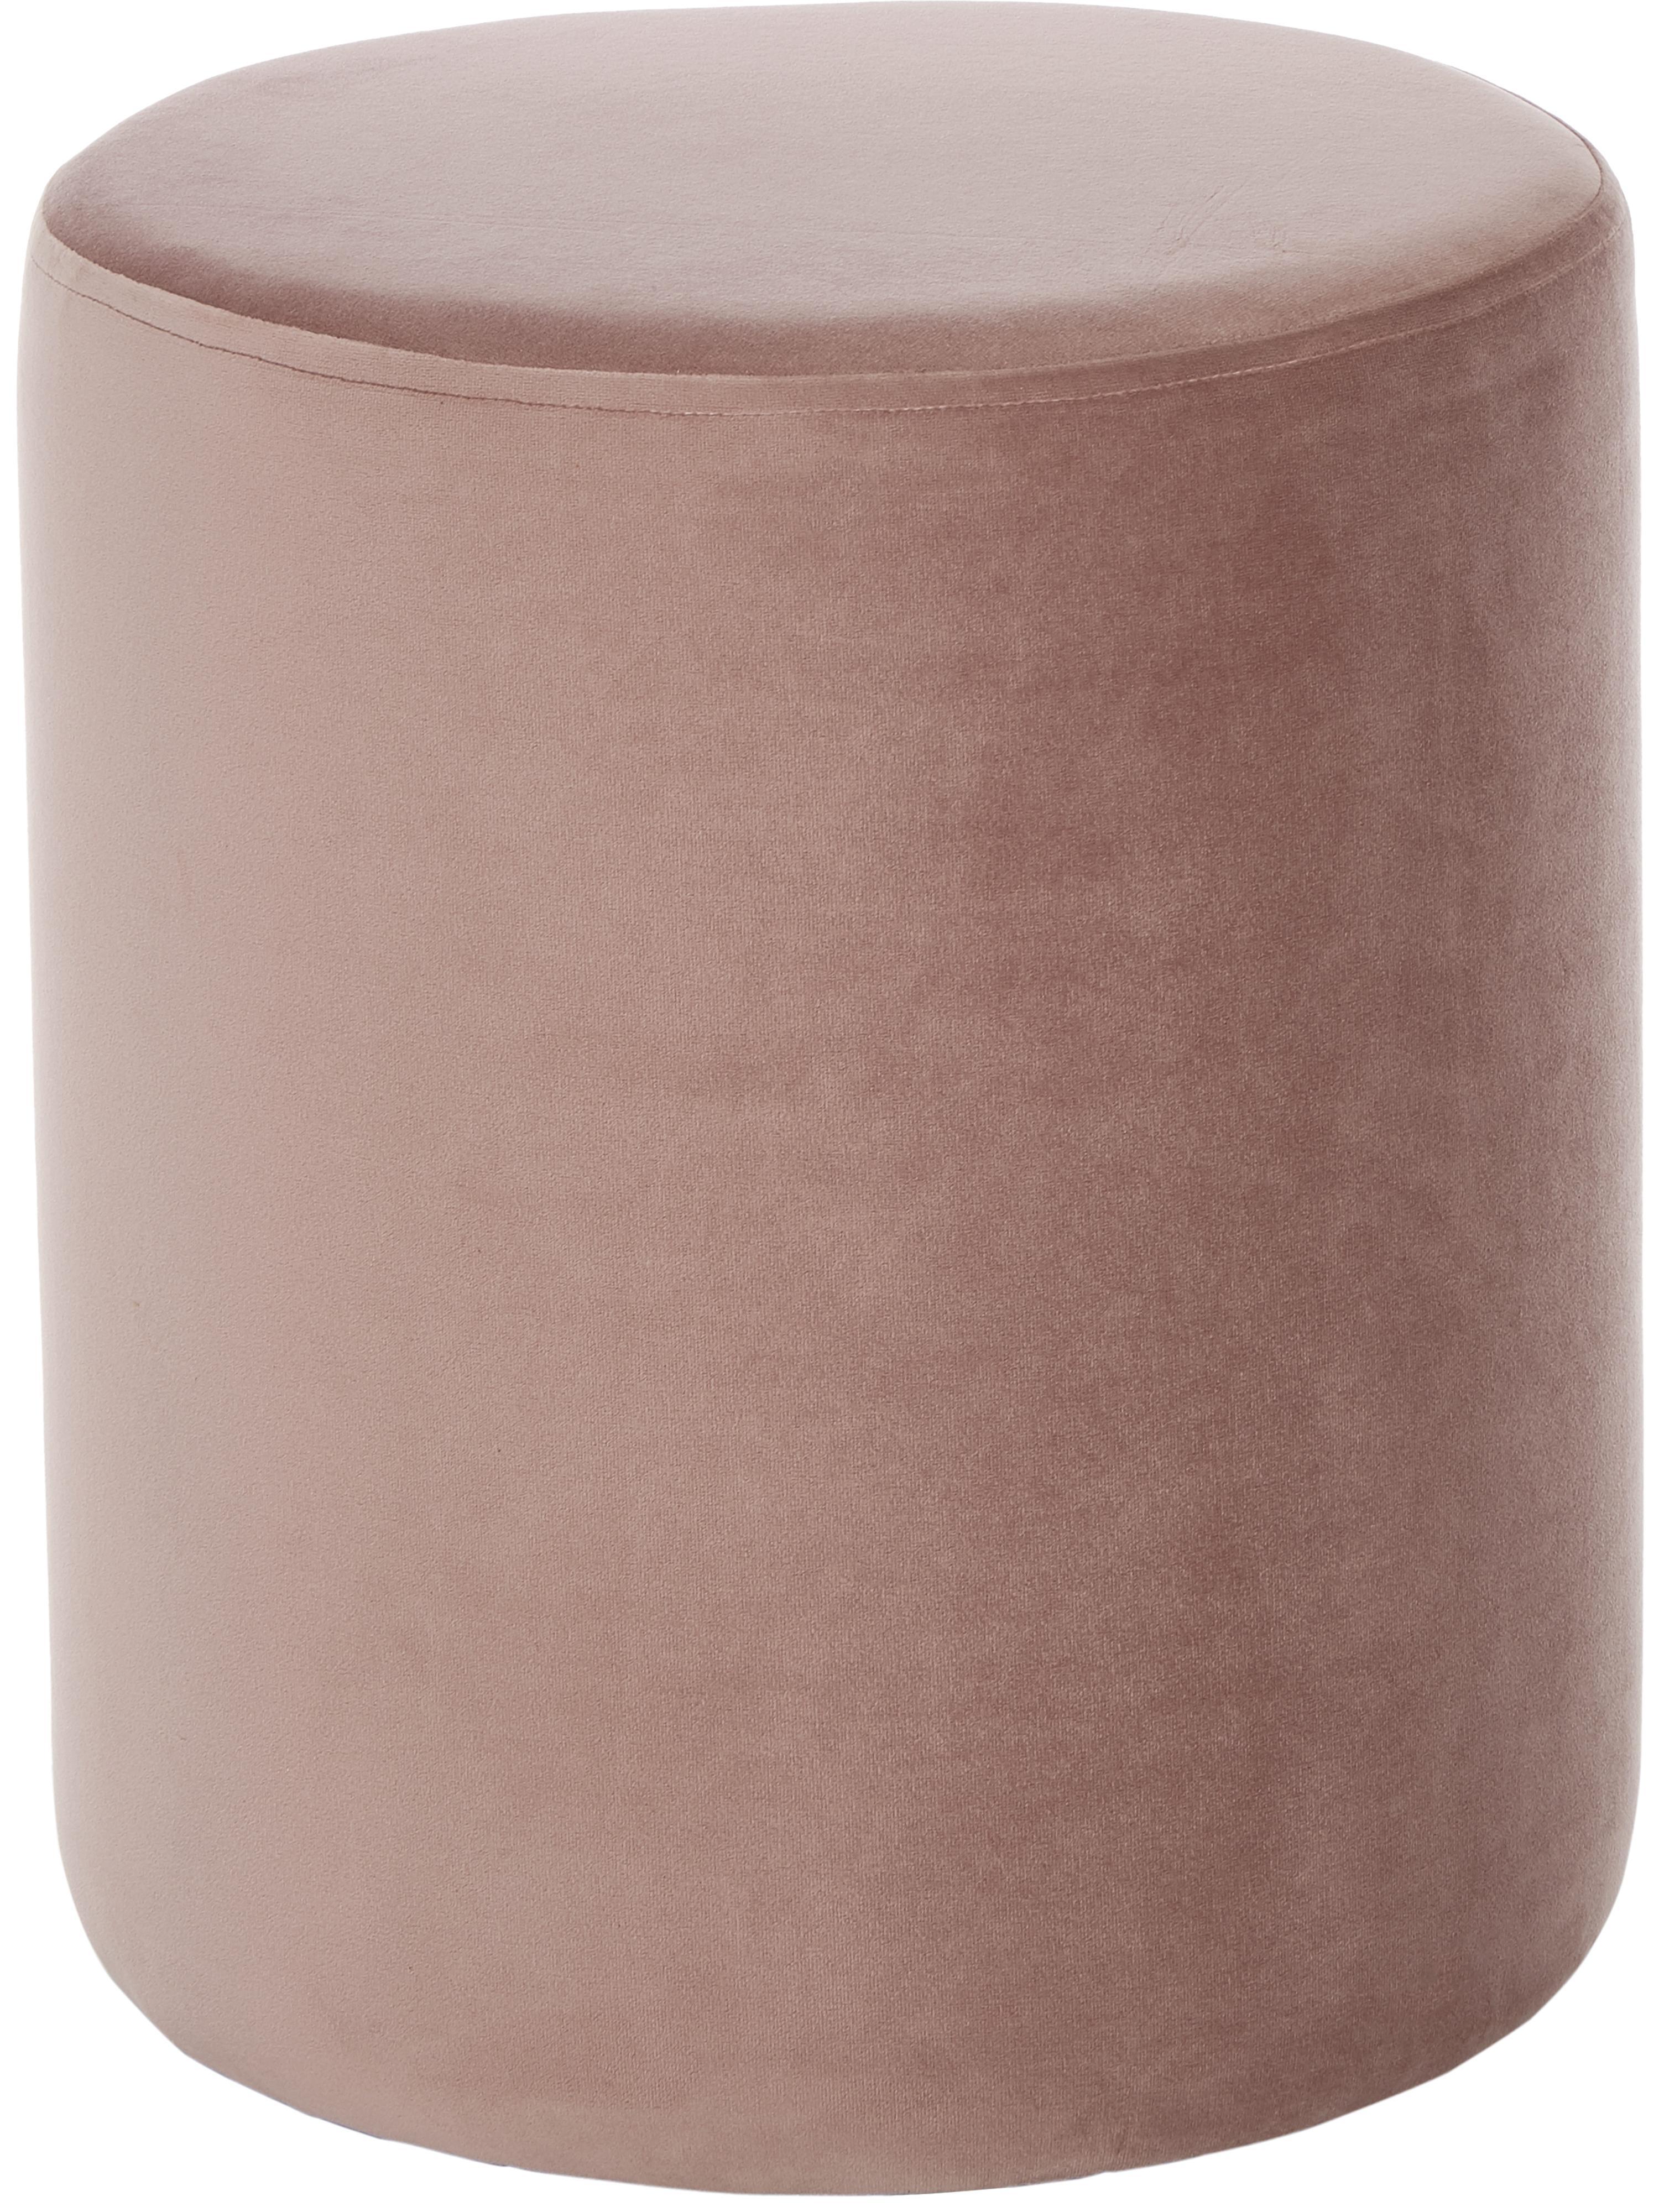 Puf de terciopelo Daisy, Tapizado: terciopelo (poliéster) 15, Estructura: tablero de fibras de dens, Rosa, Ø 40 x Al 46 cm